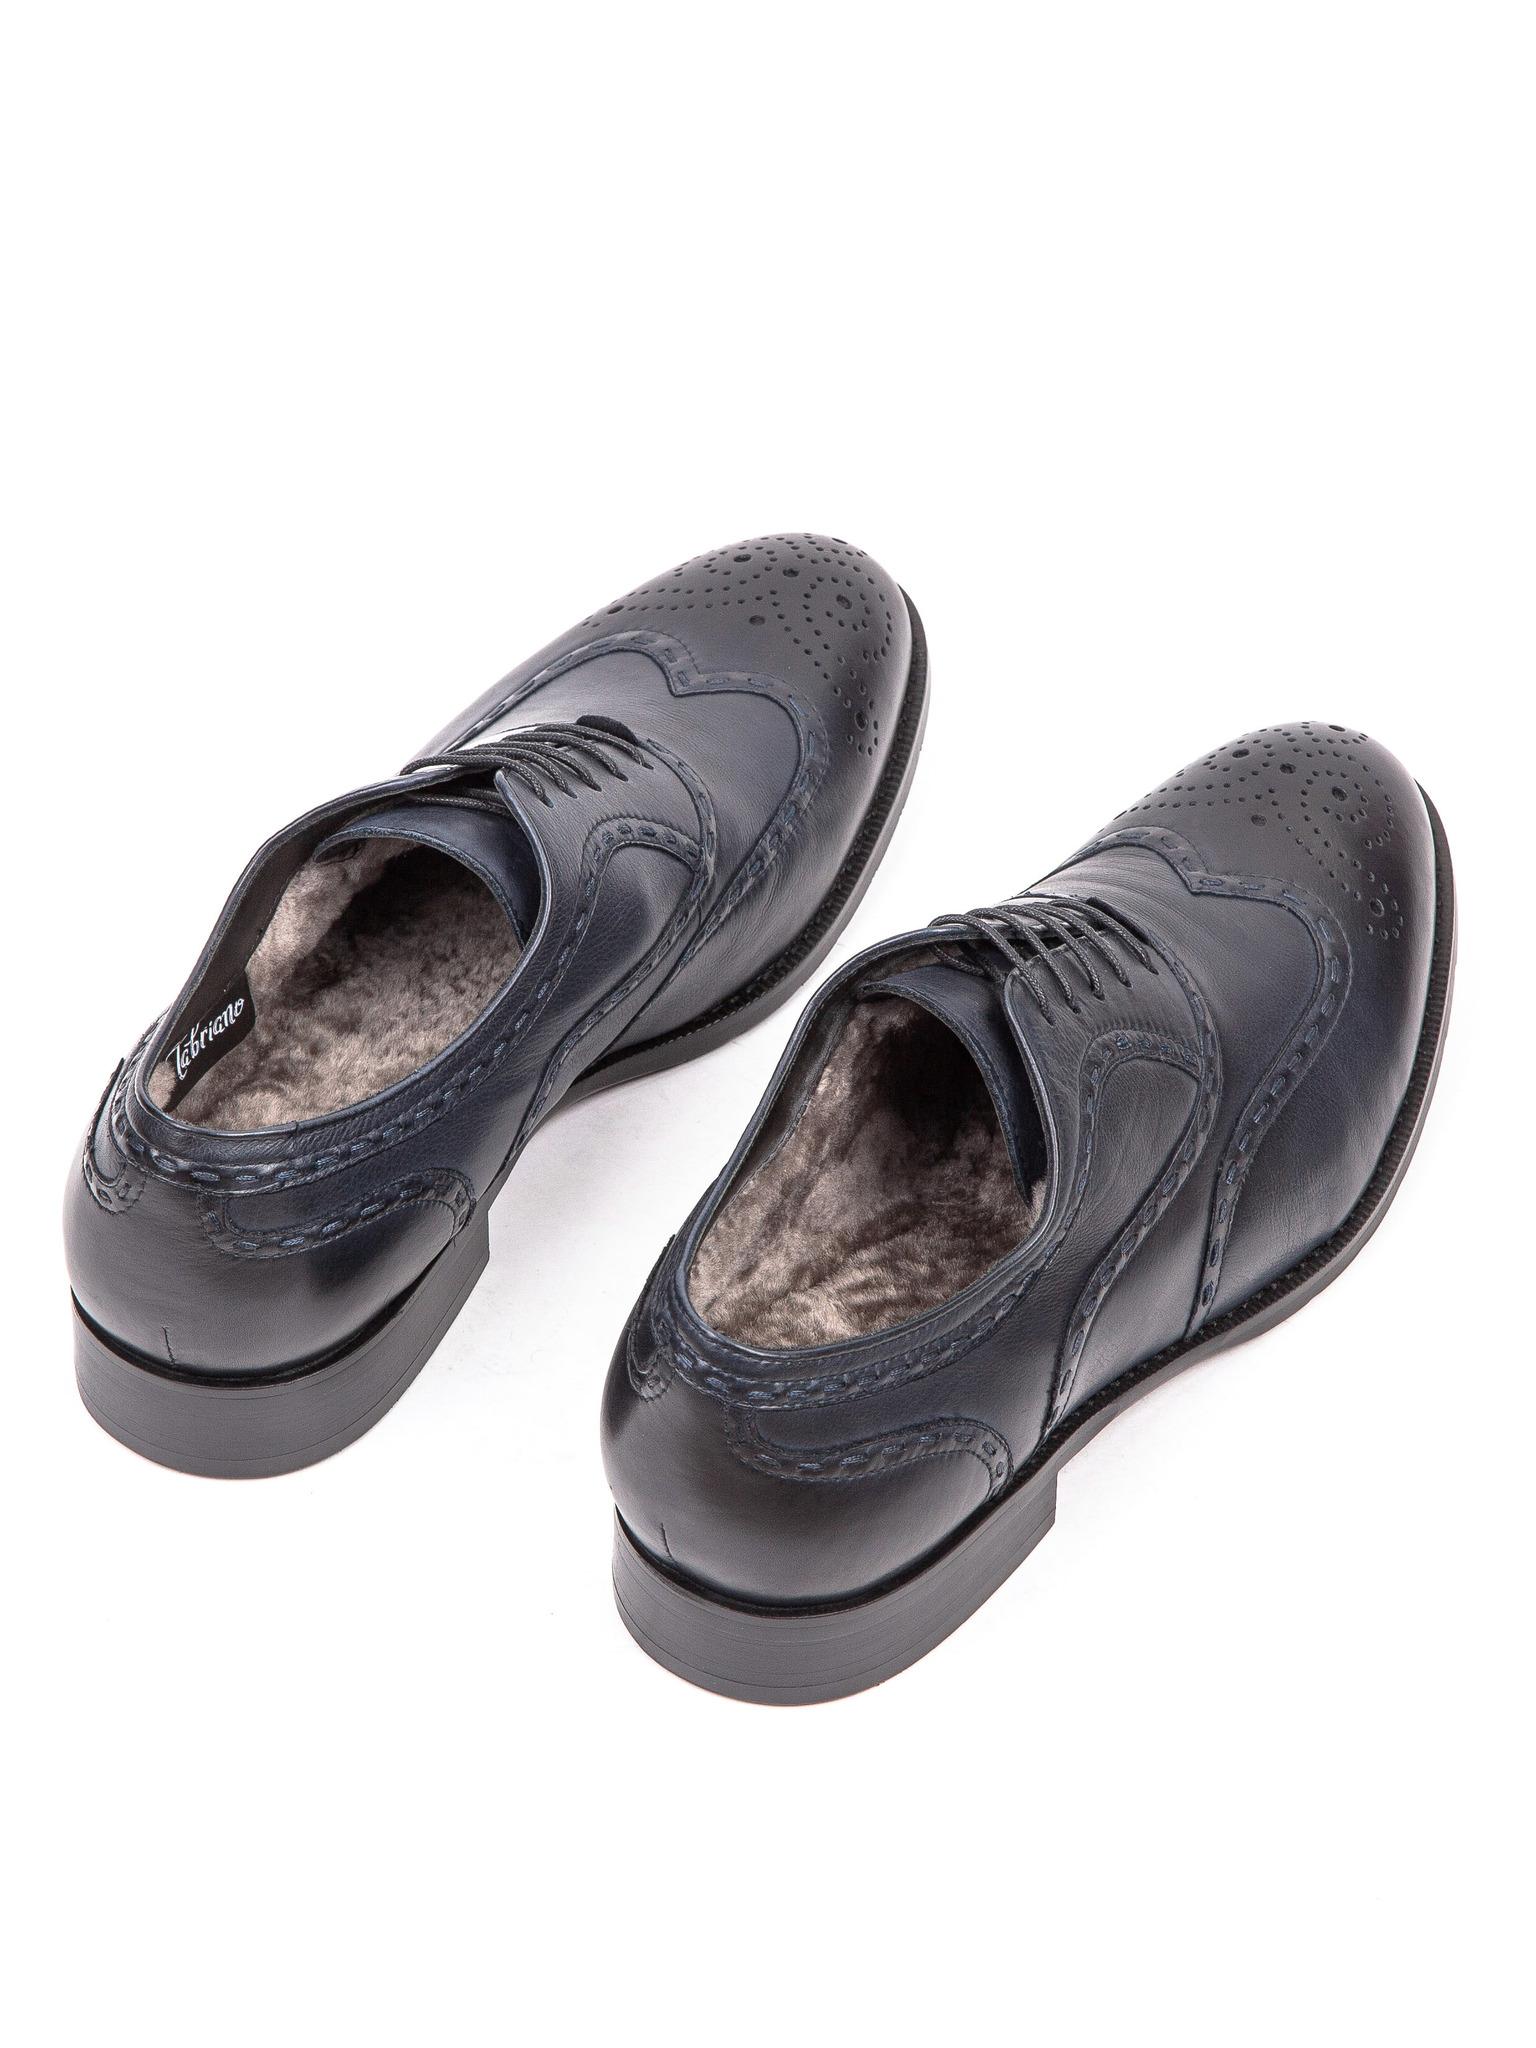 TABRIANO туфли мужские зимние